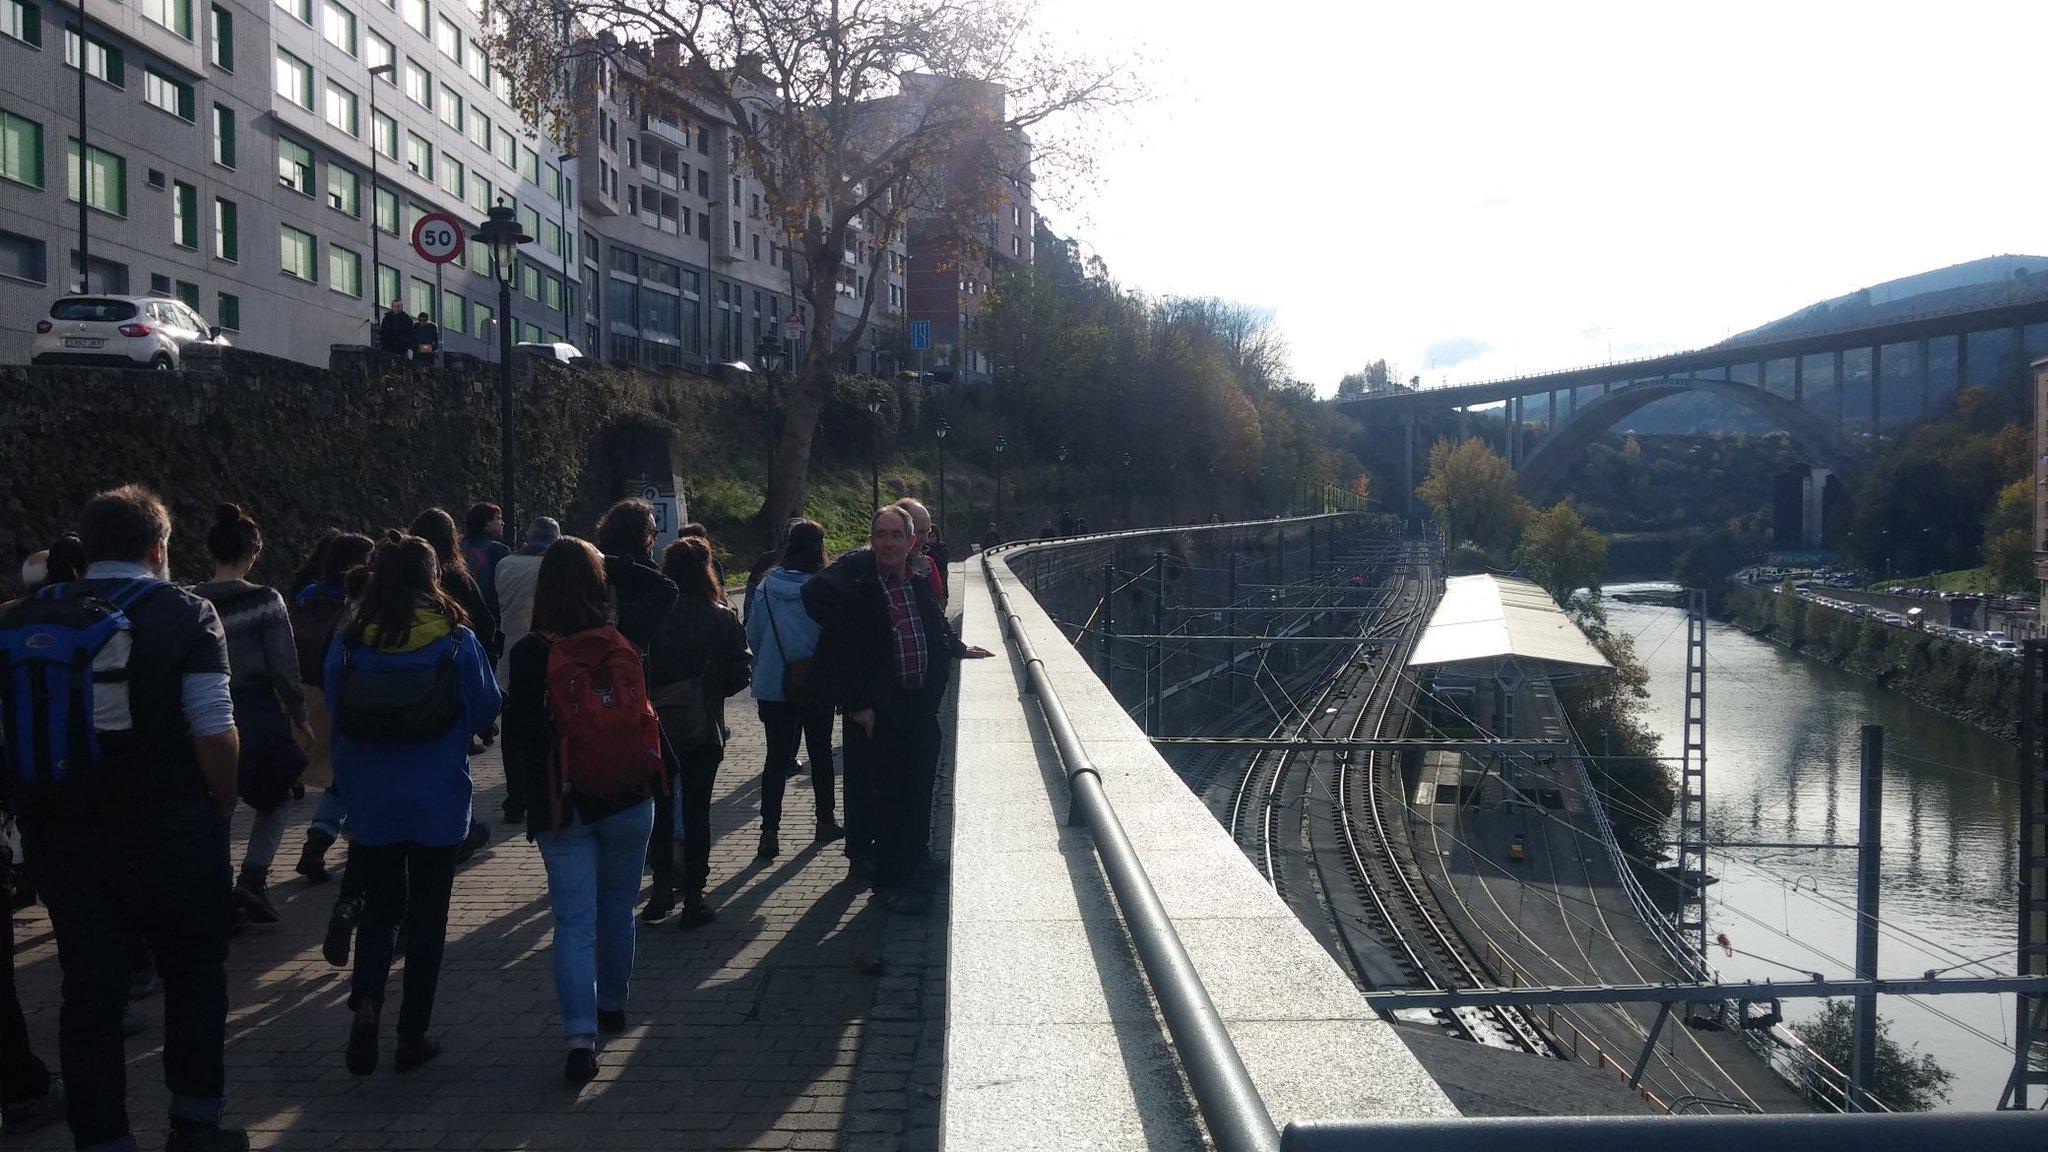 Paseo de los caños #Urbanbat16 Bilbao https://t.co/61kVq7dmuv